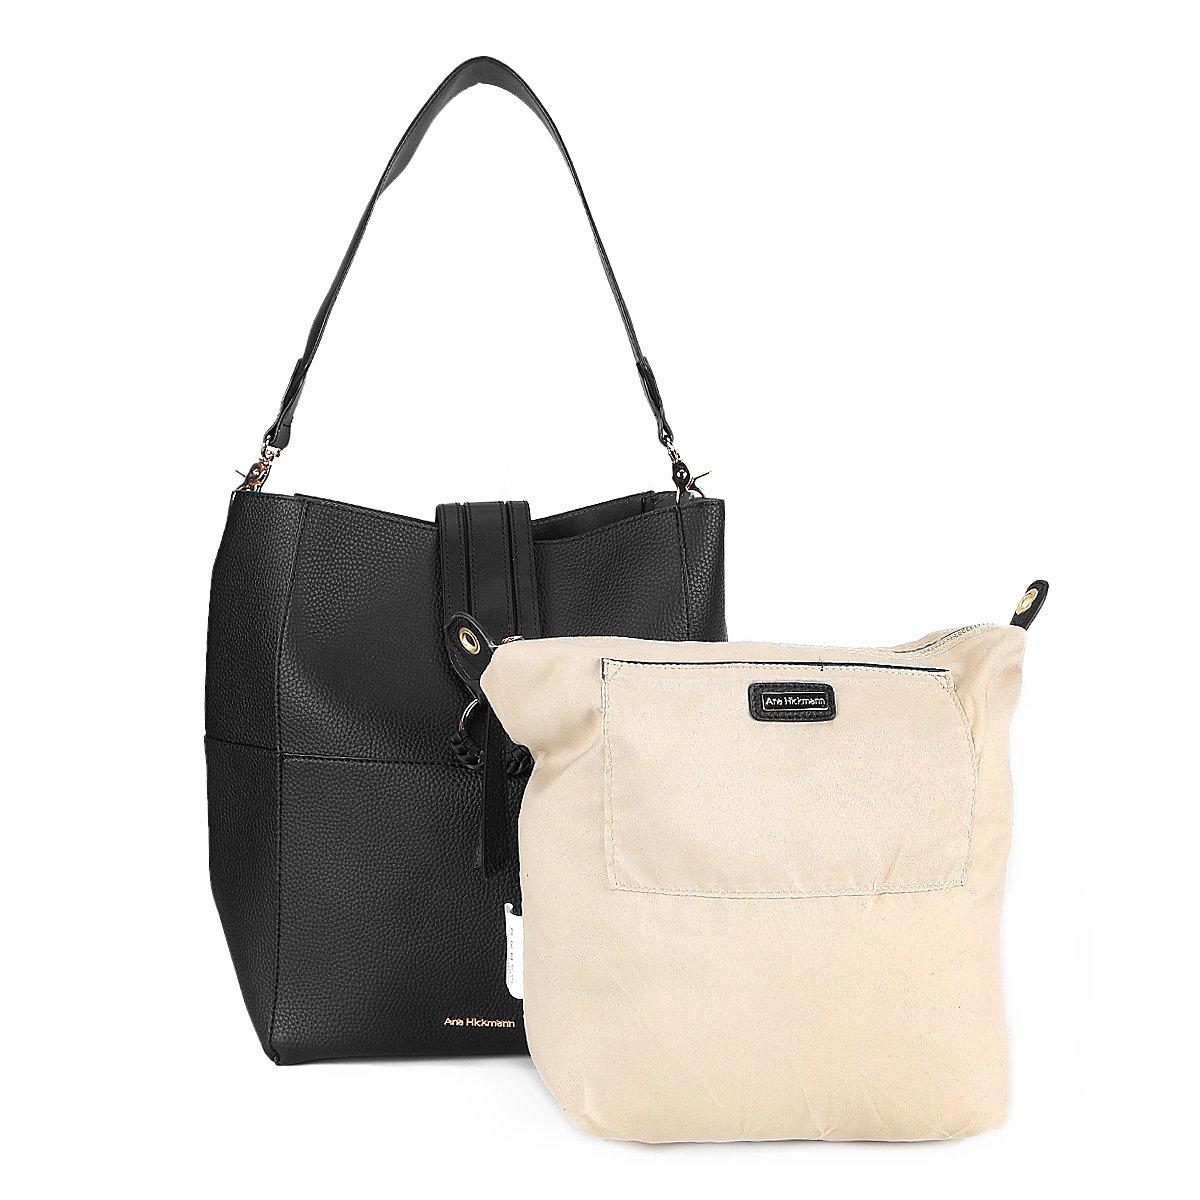 05b9602ecda9b Bolsa Ana Hickmann Handbag Nécessaire Feminina